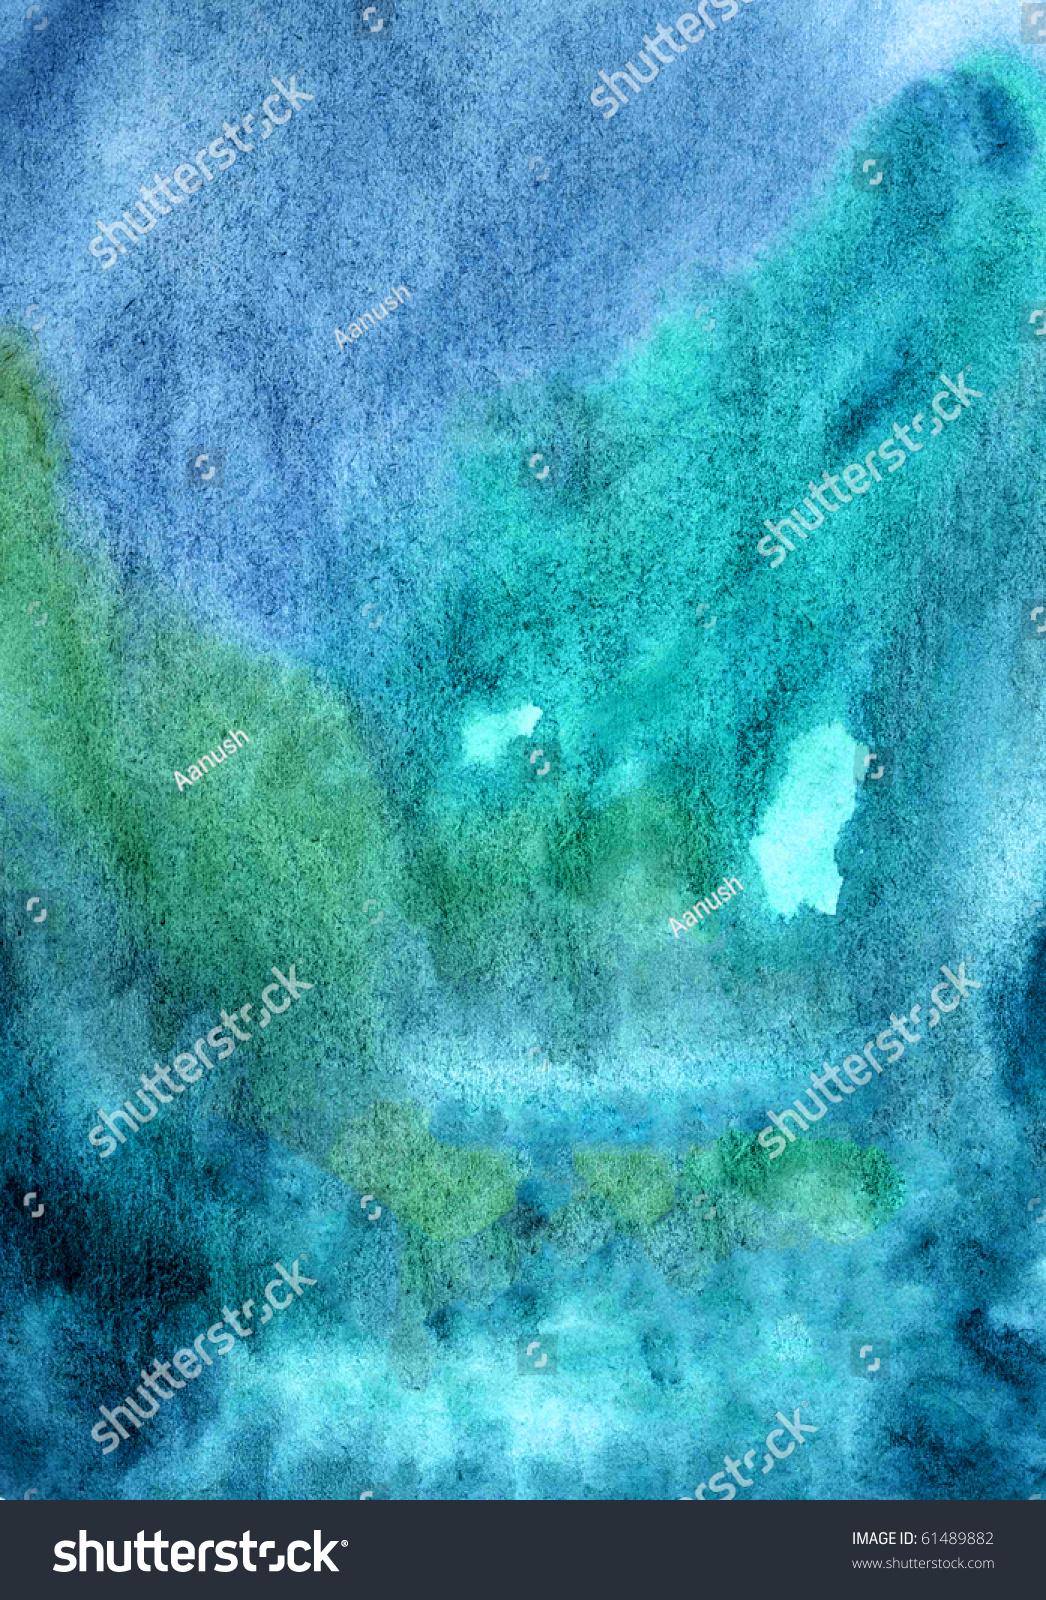 deep dark blue background water color painting wallpaper stock photo 61489882 shutterstock. Black Bedroom Furniture Sets. Home Design Ideas